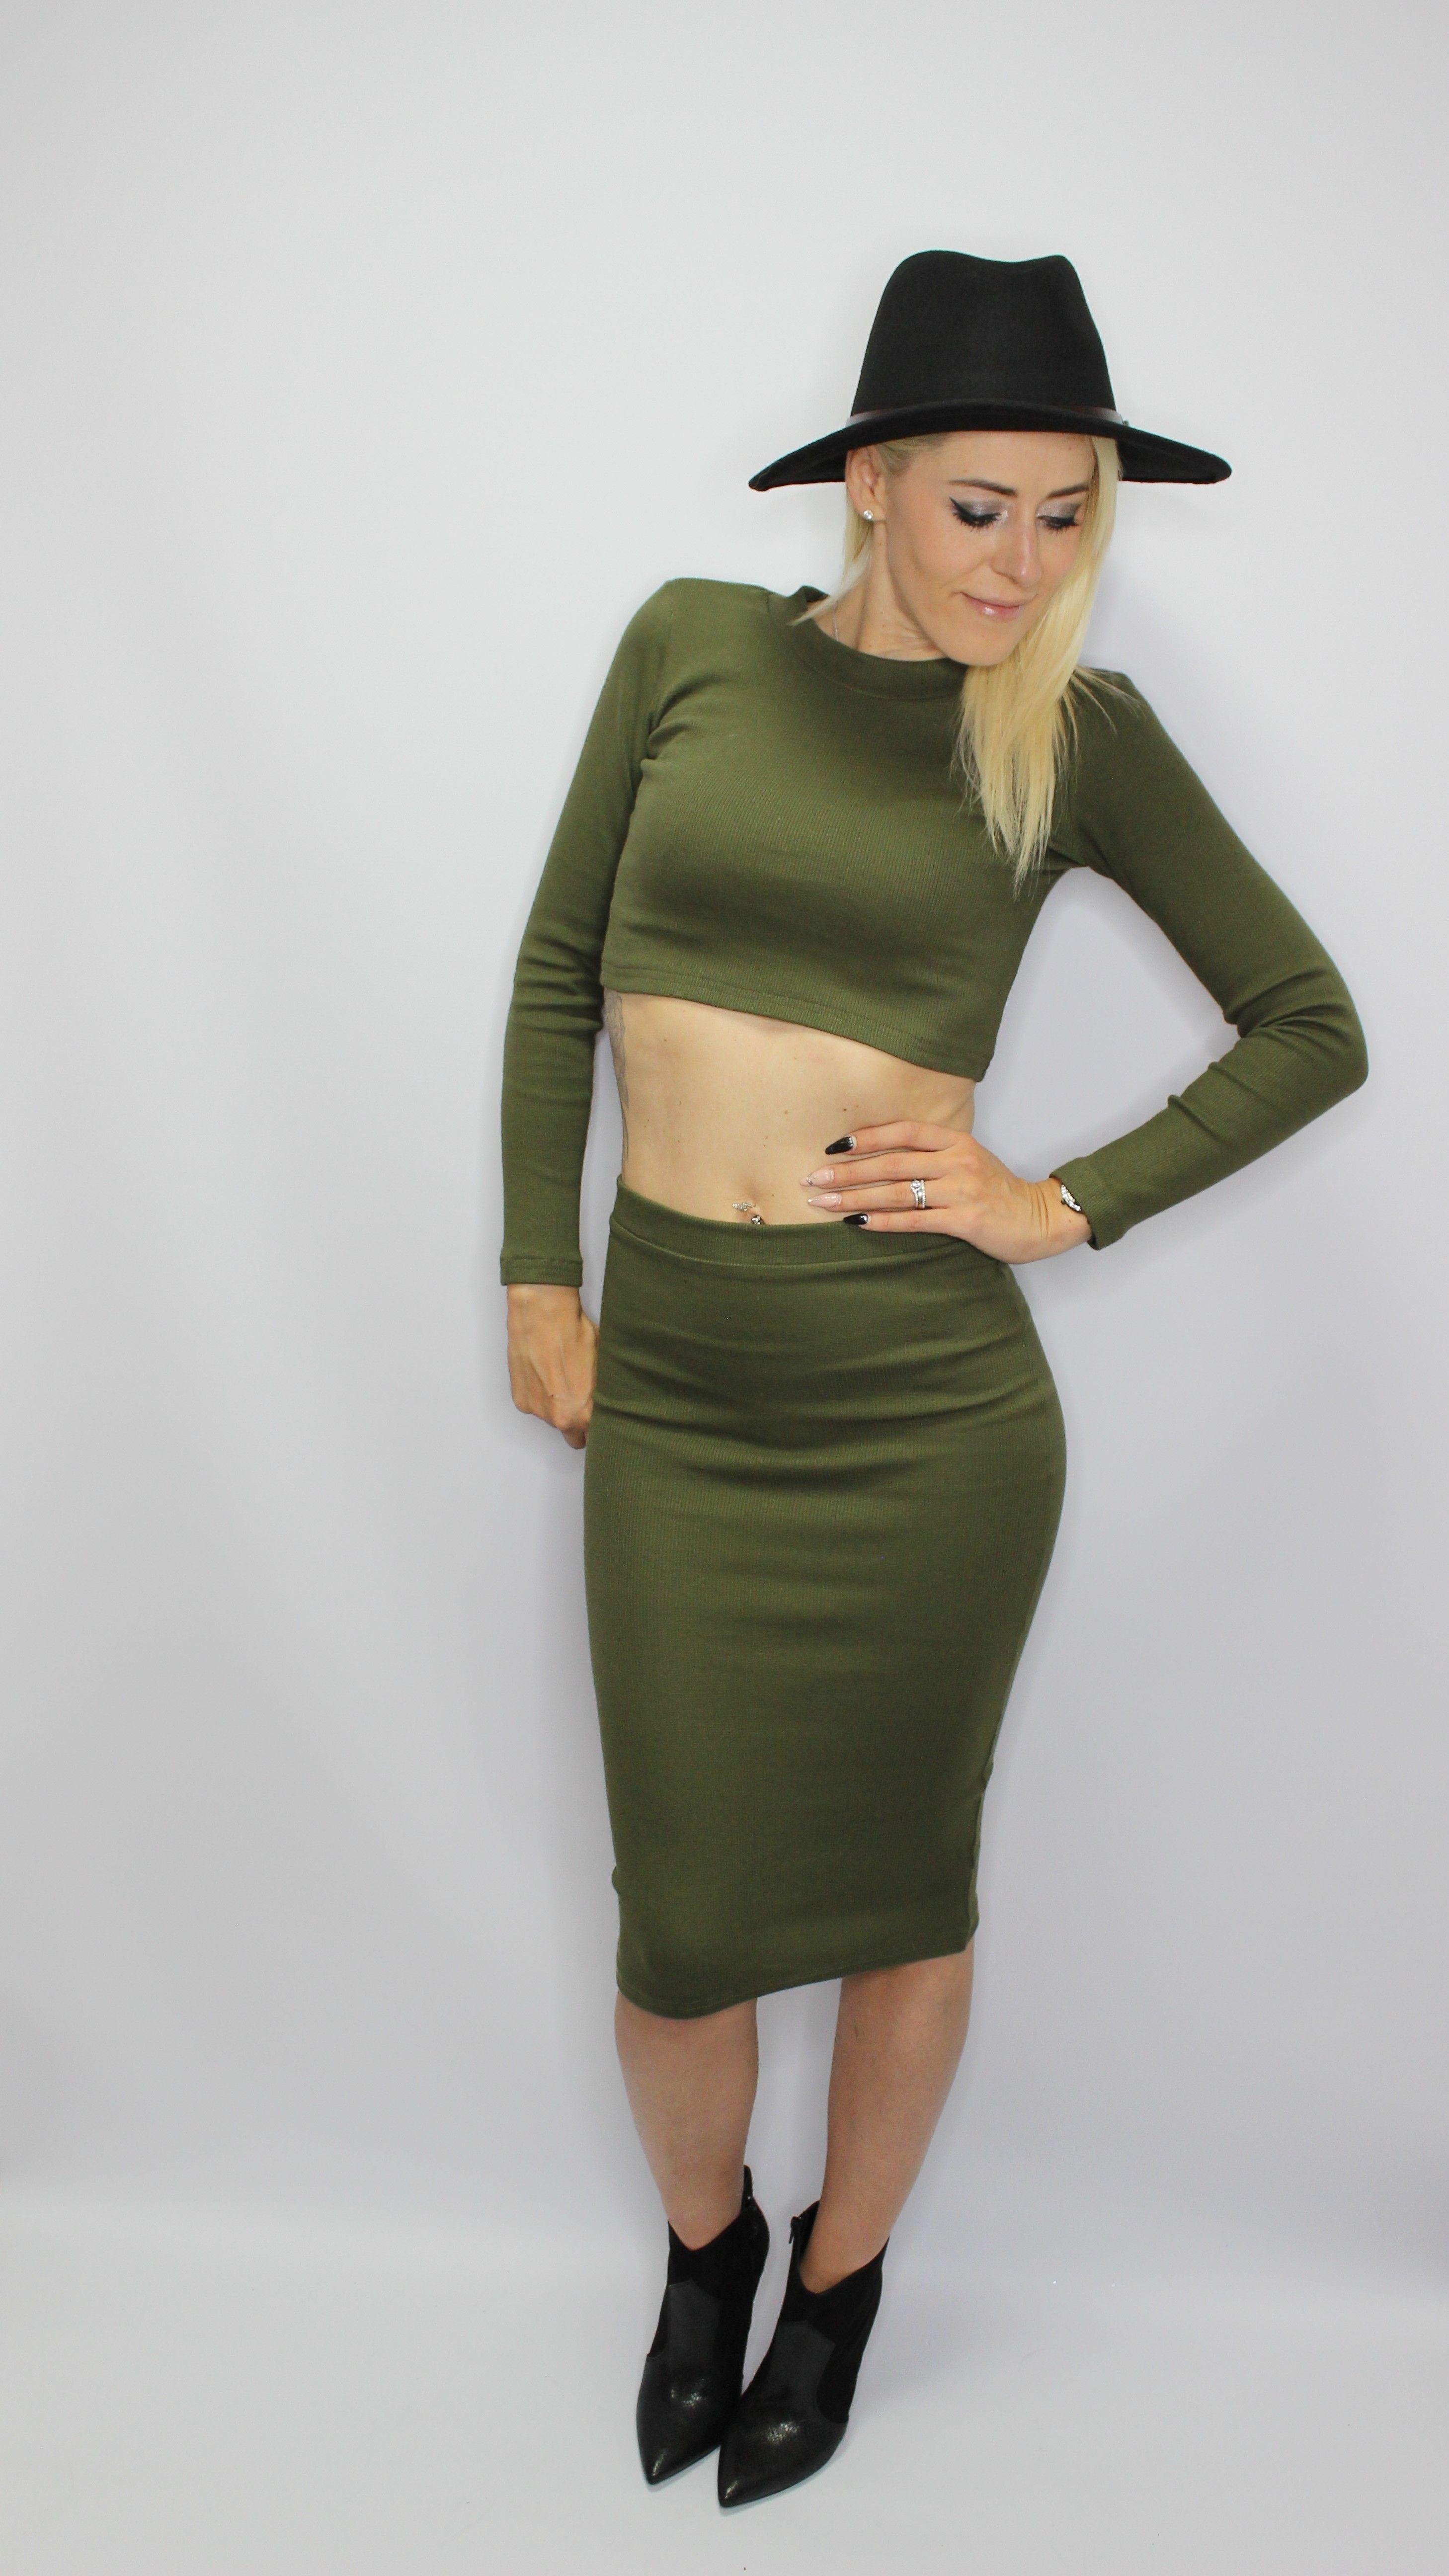 Khaki 2 Piece Skirt/Top Set